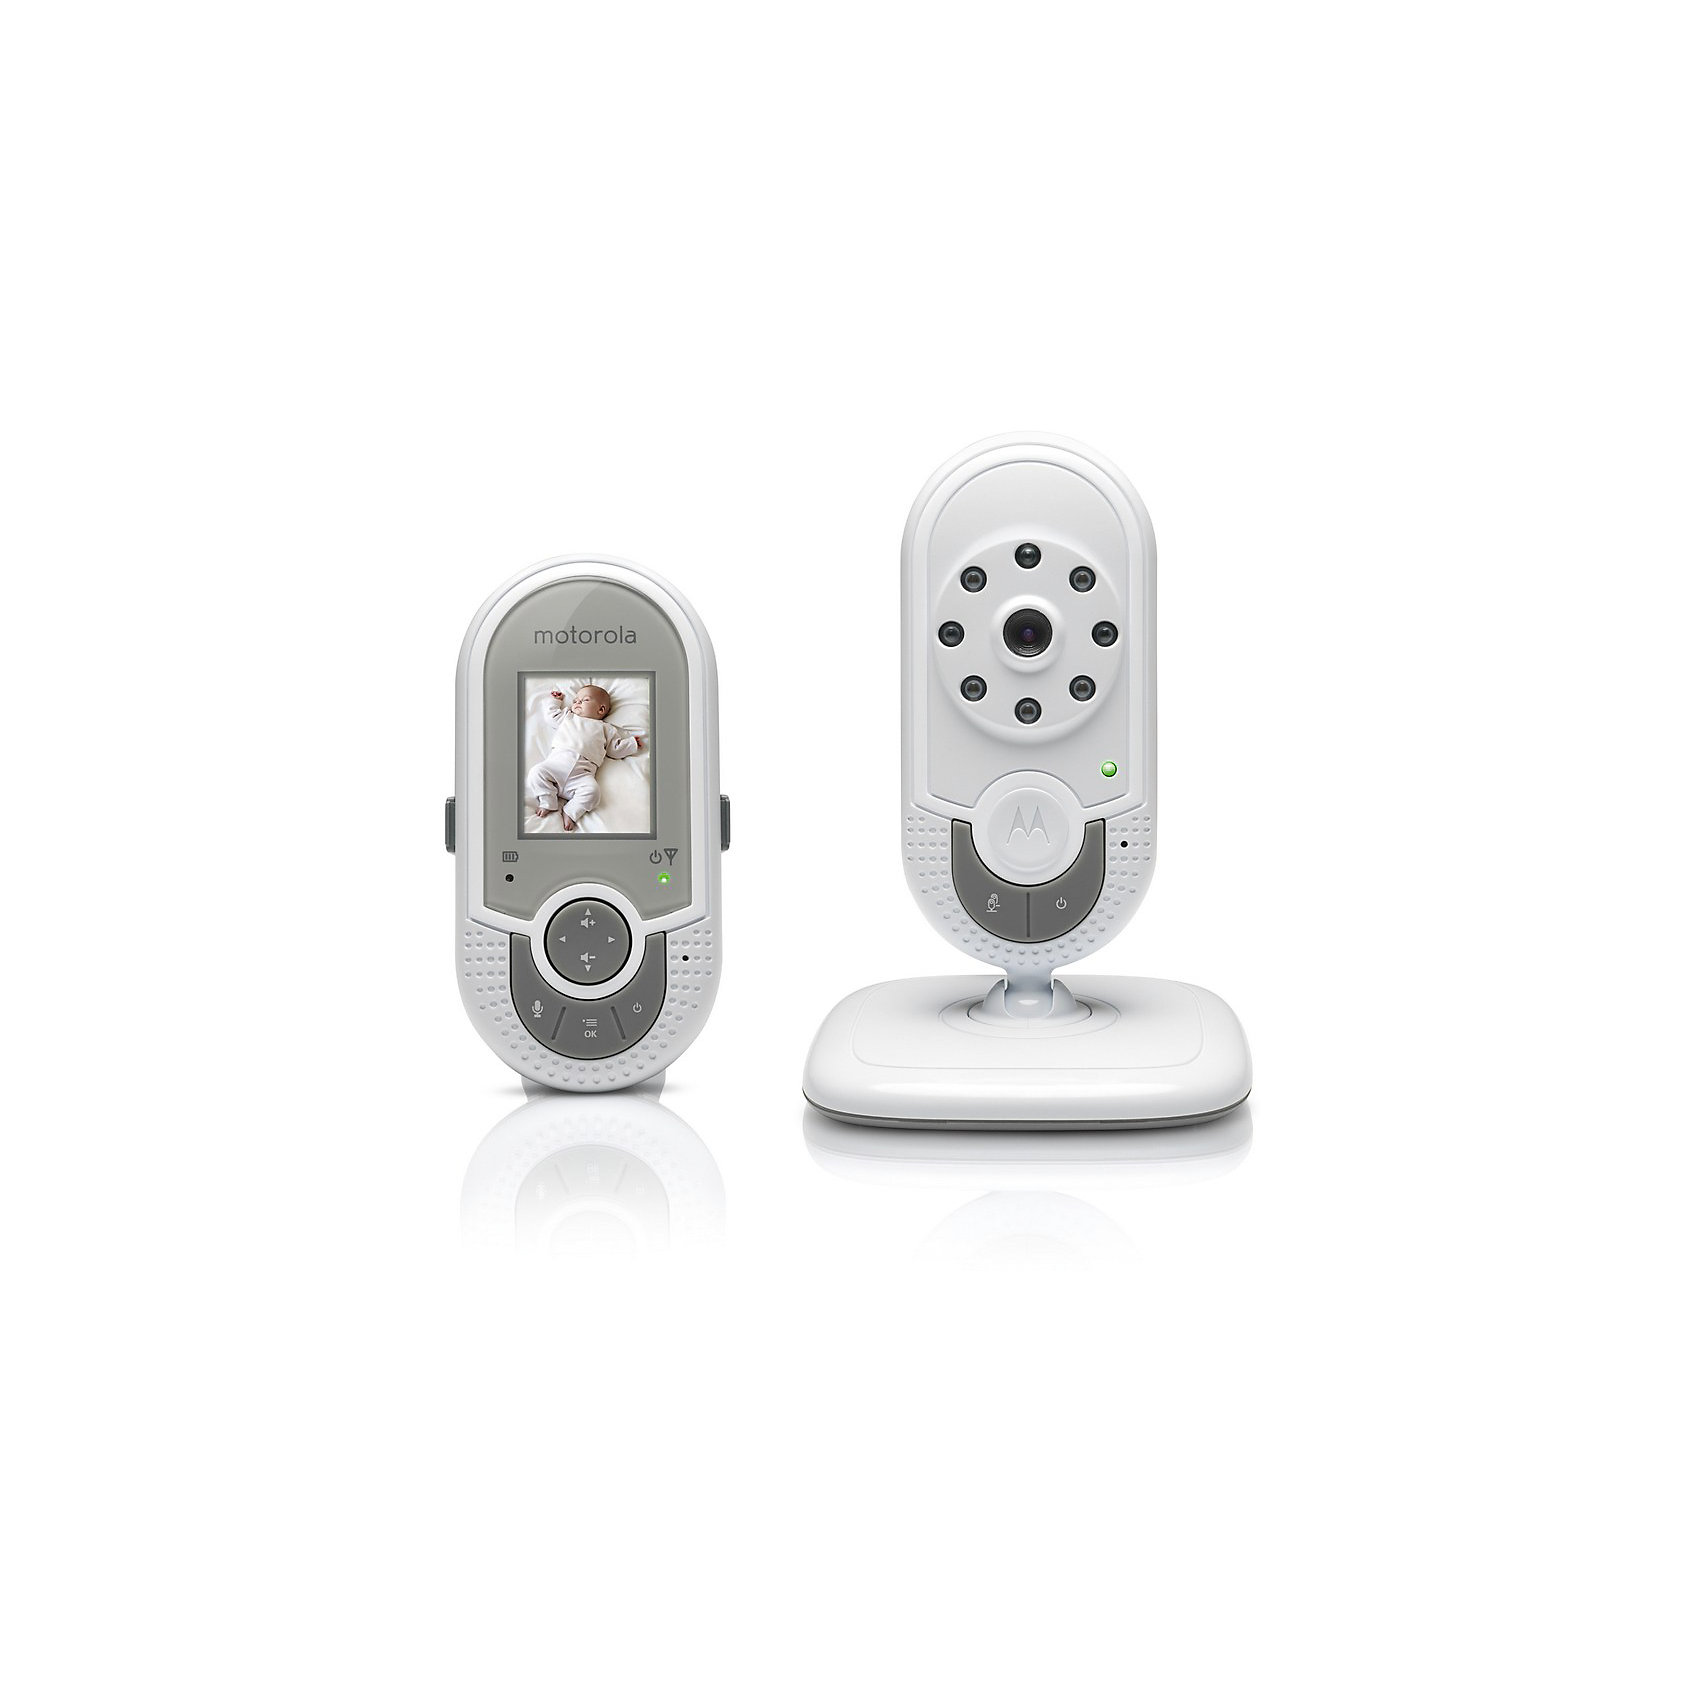 Видеоняня MBP621 Motorola, белый<br><br>Ширина мм: 170<br>Глубина мм: 110<br>Высота мм: 155<br>Вес г: 630<br>Возраст от месяцев: 0<br>Возраст до месяцев: 36<br>Пол: Унисекс<br>Возраст: Детский<br>SKU: 4420764